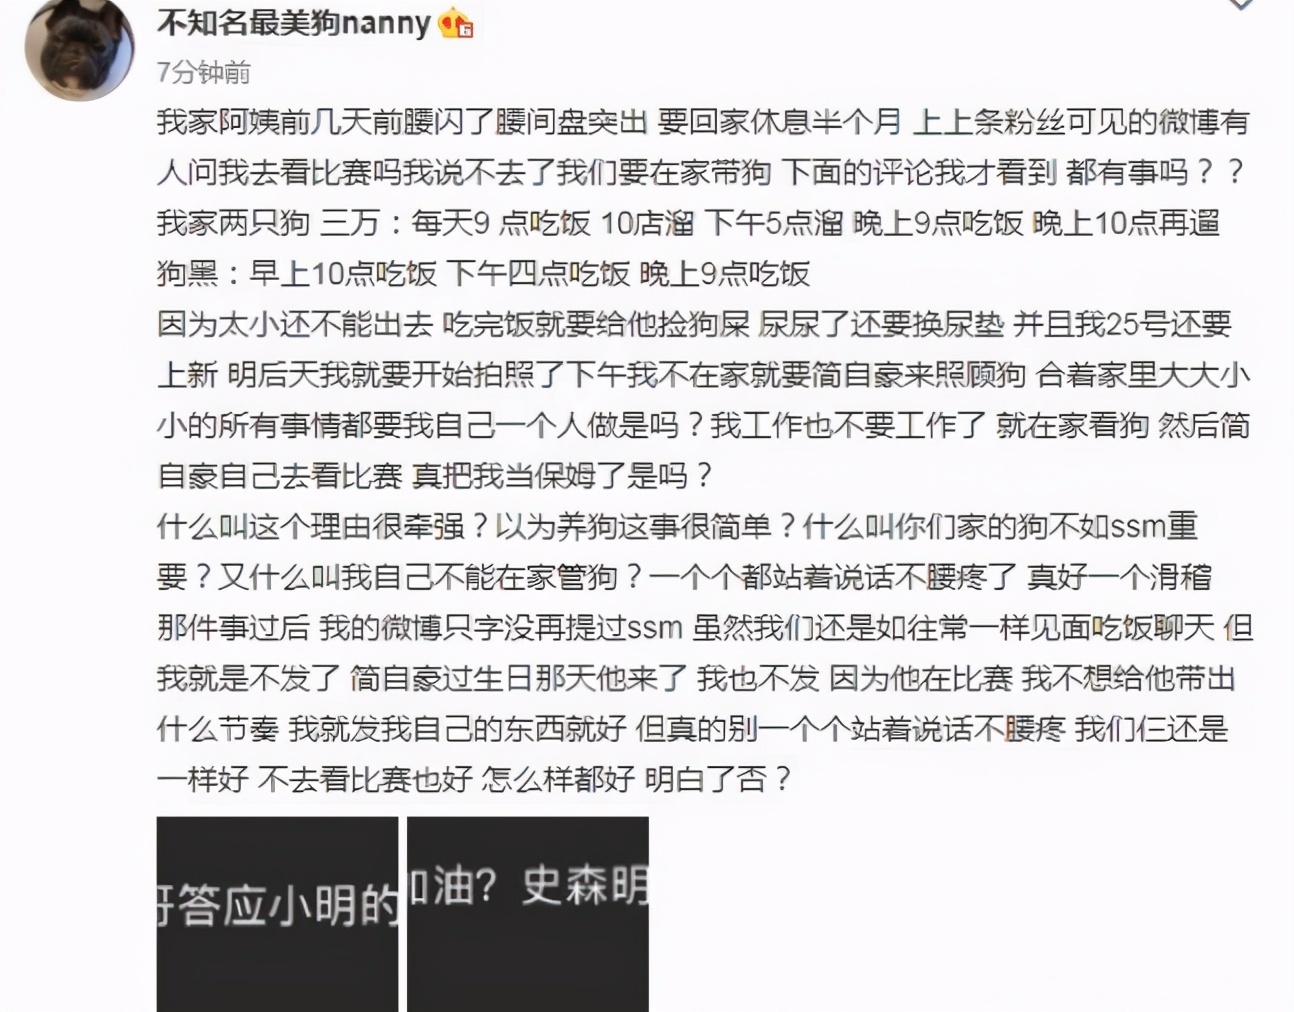 Uzi拒绝参加LPL决赛引争议,女友奥咪咪回应:RNG没有喂狗重要